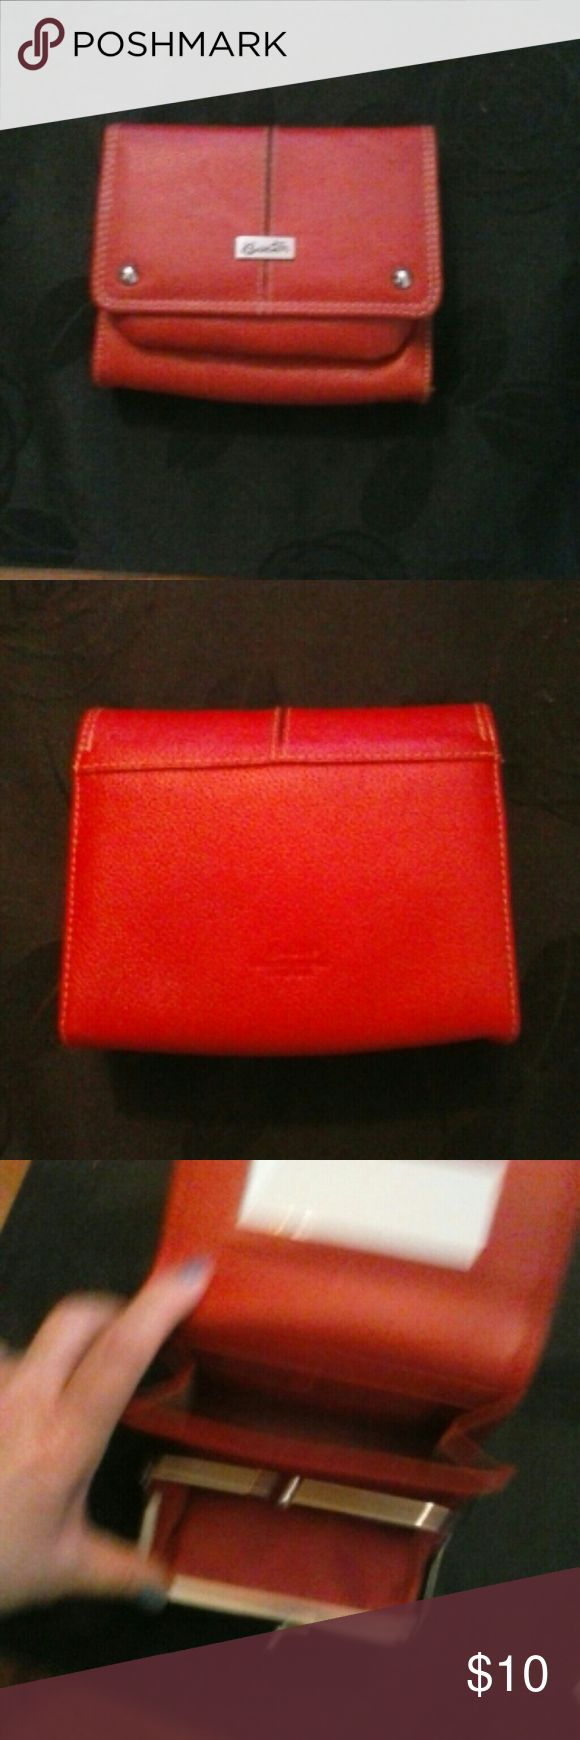 Best 25+ Buxton wallets ideas on Pinterest | Vestido con escote ...